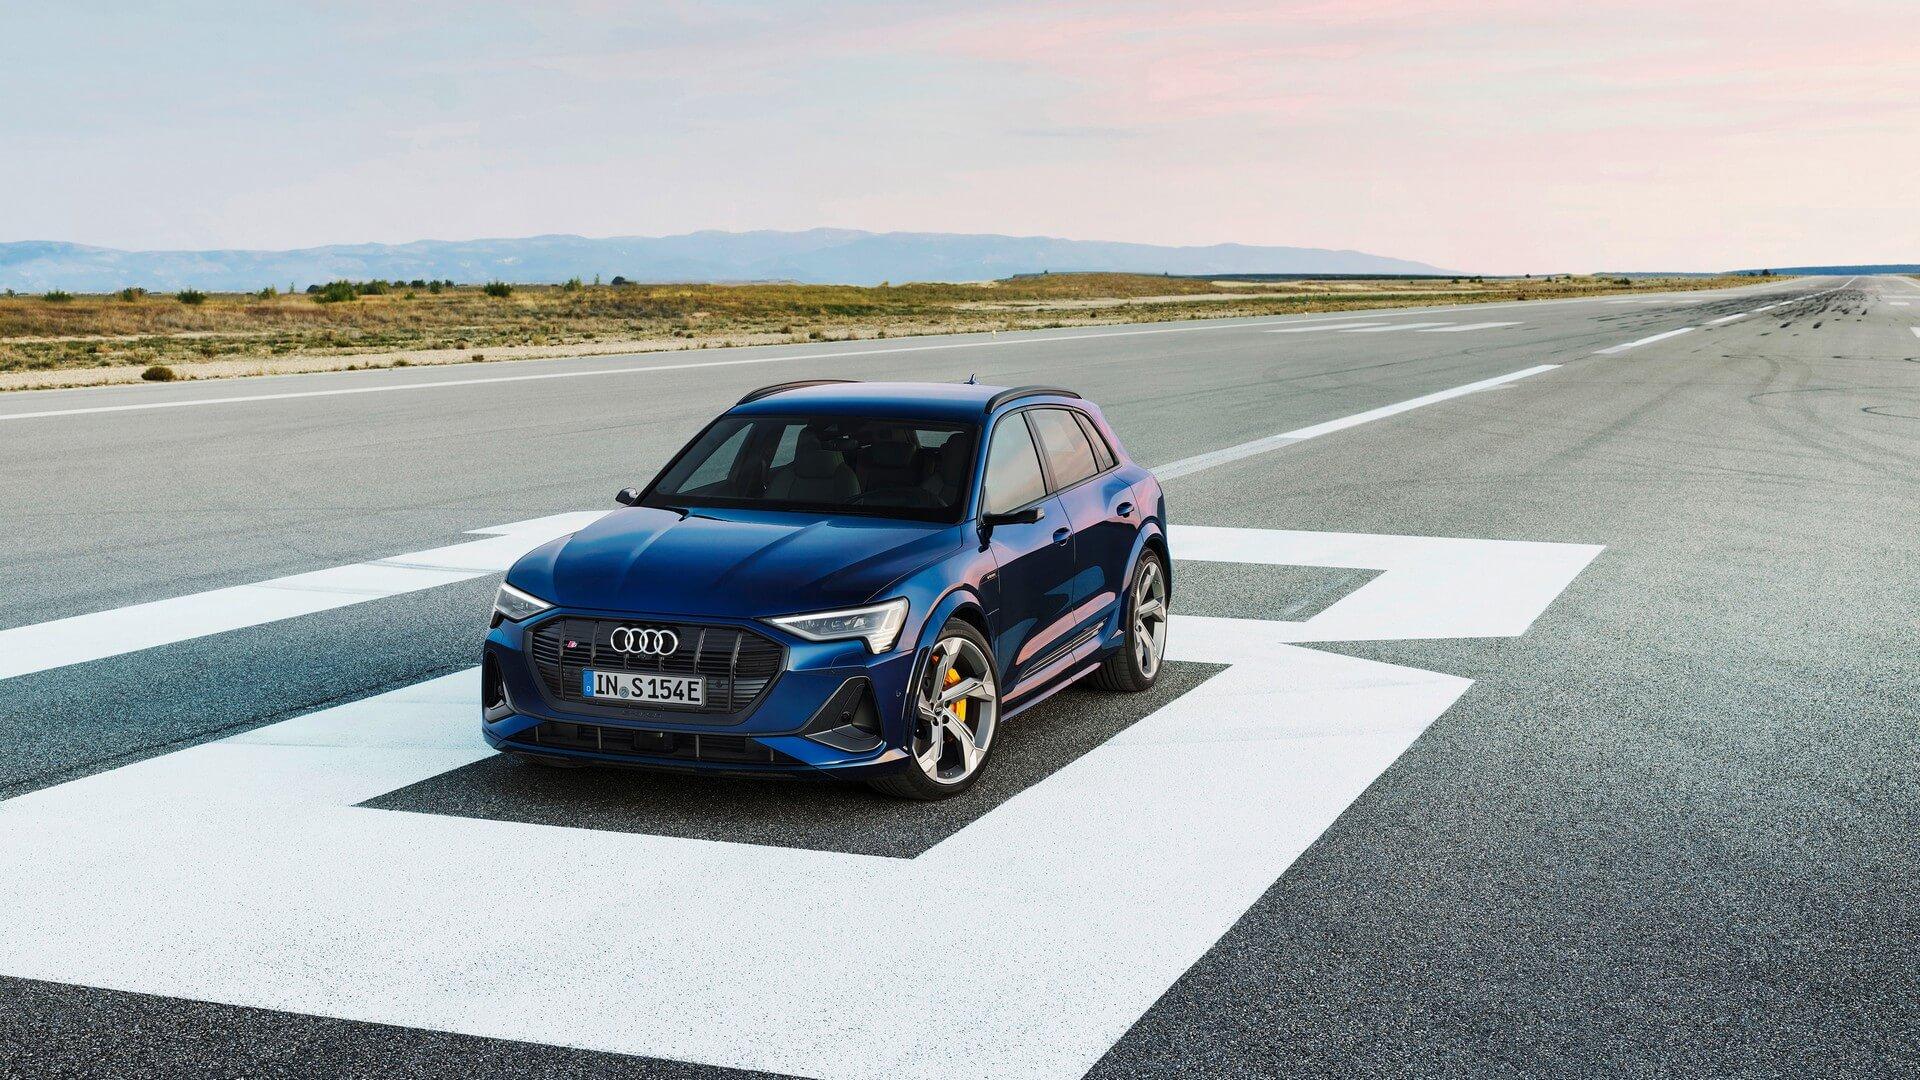 Audi-E-Tron-S-and-E-Tron-S-Sportback-2020-24